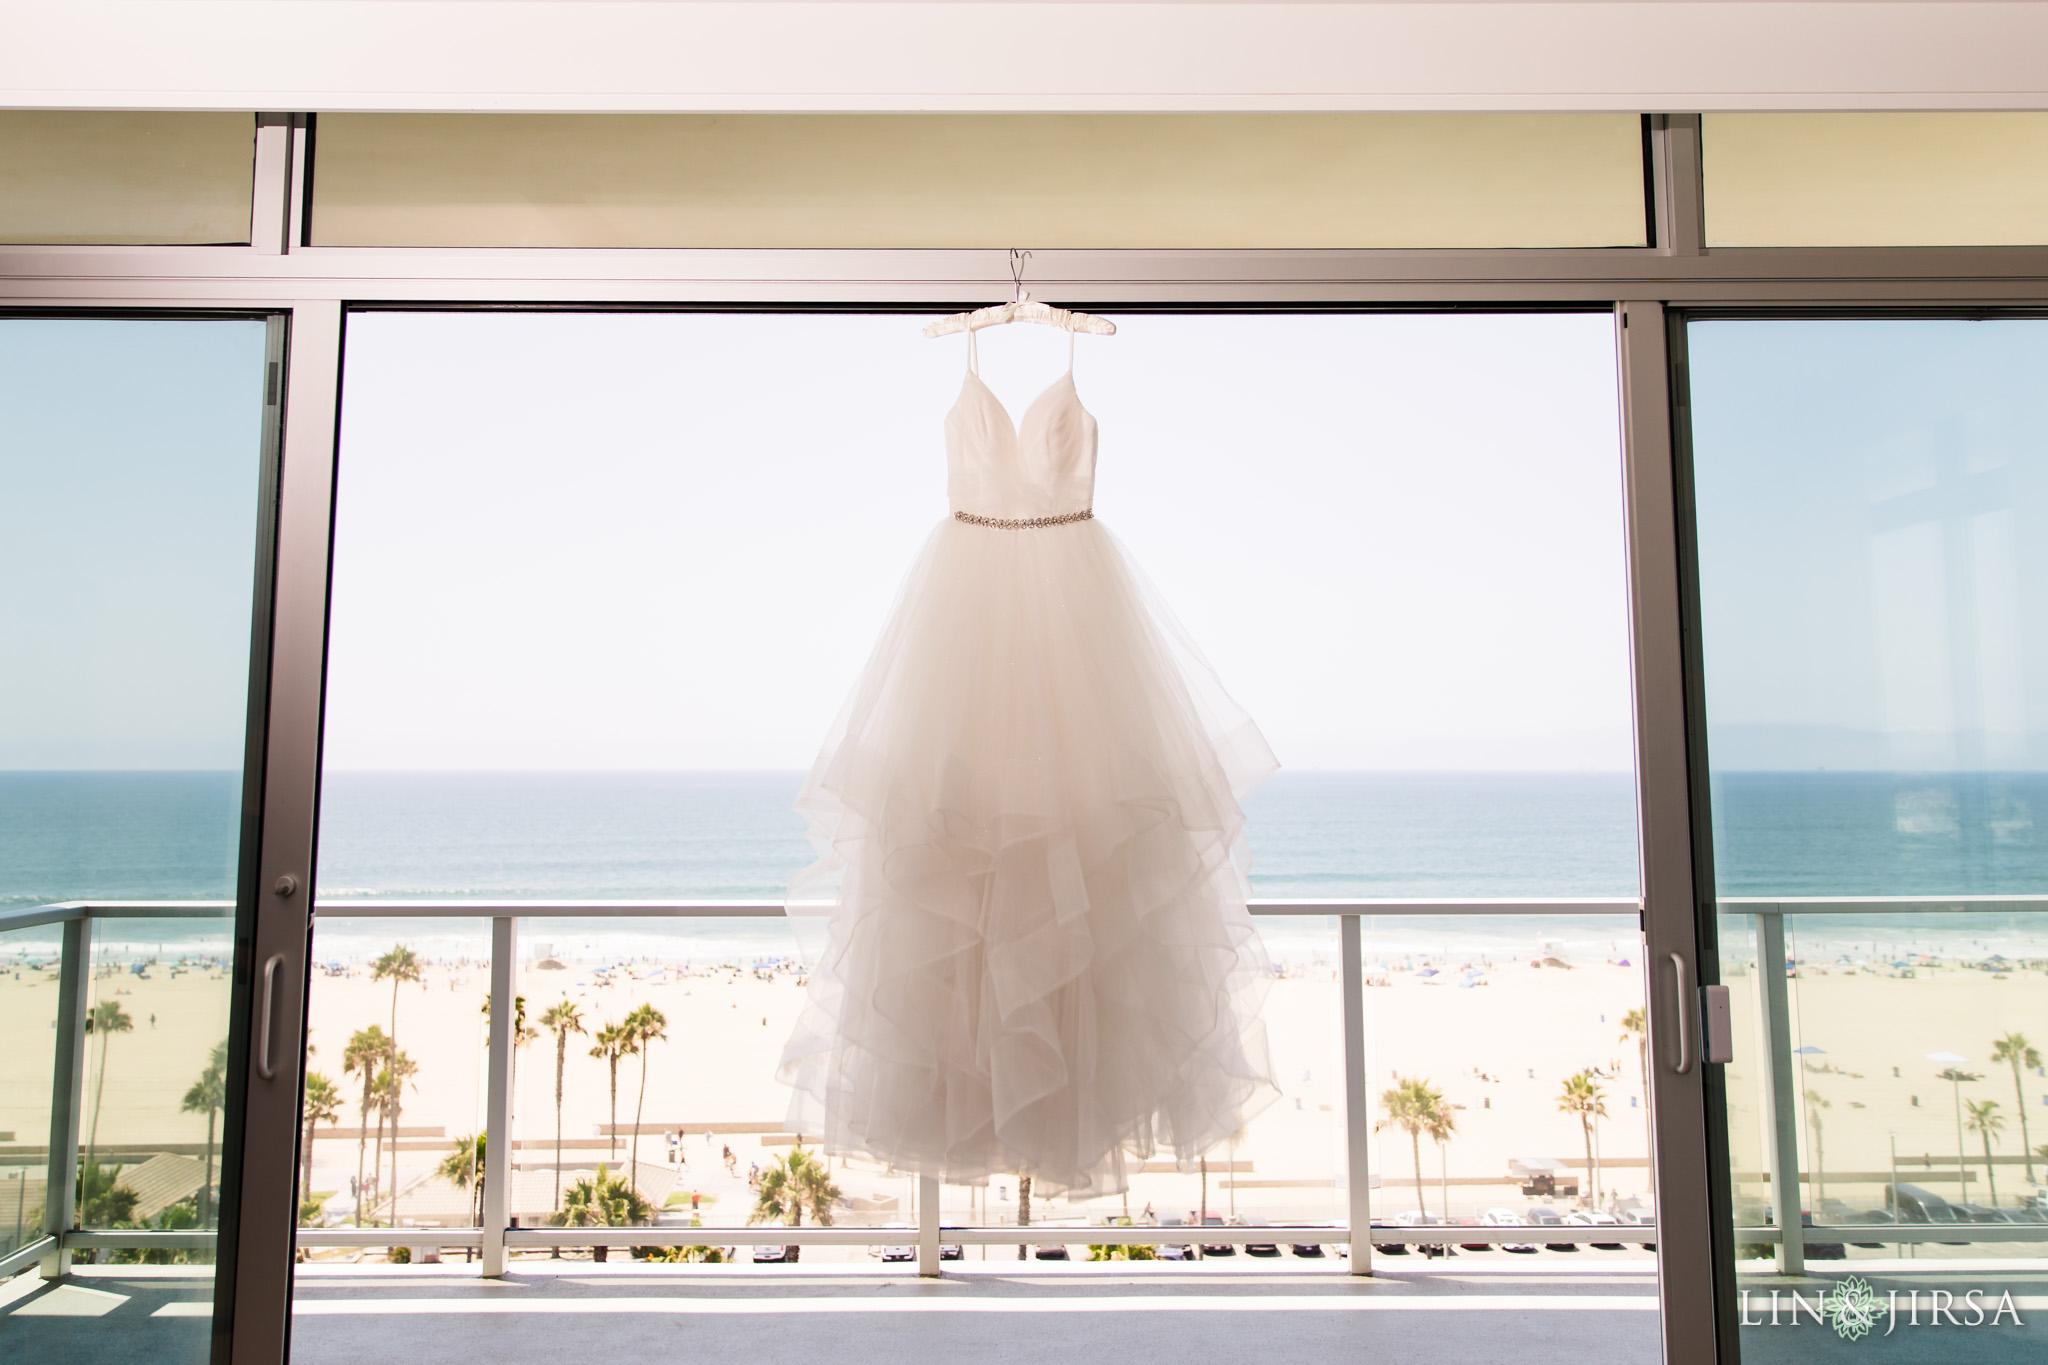 znc pasea hotel huntington beach wedding photography